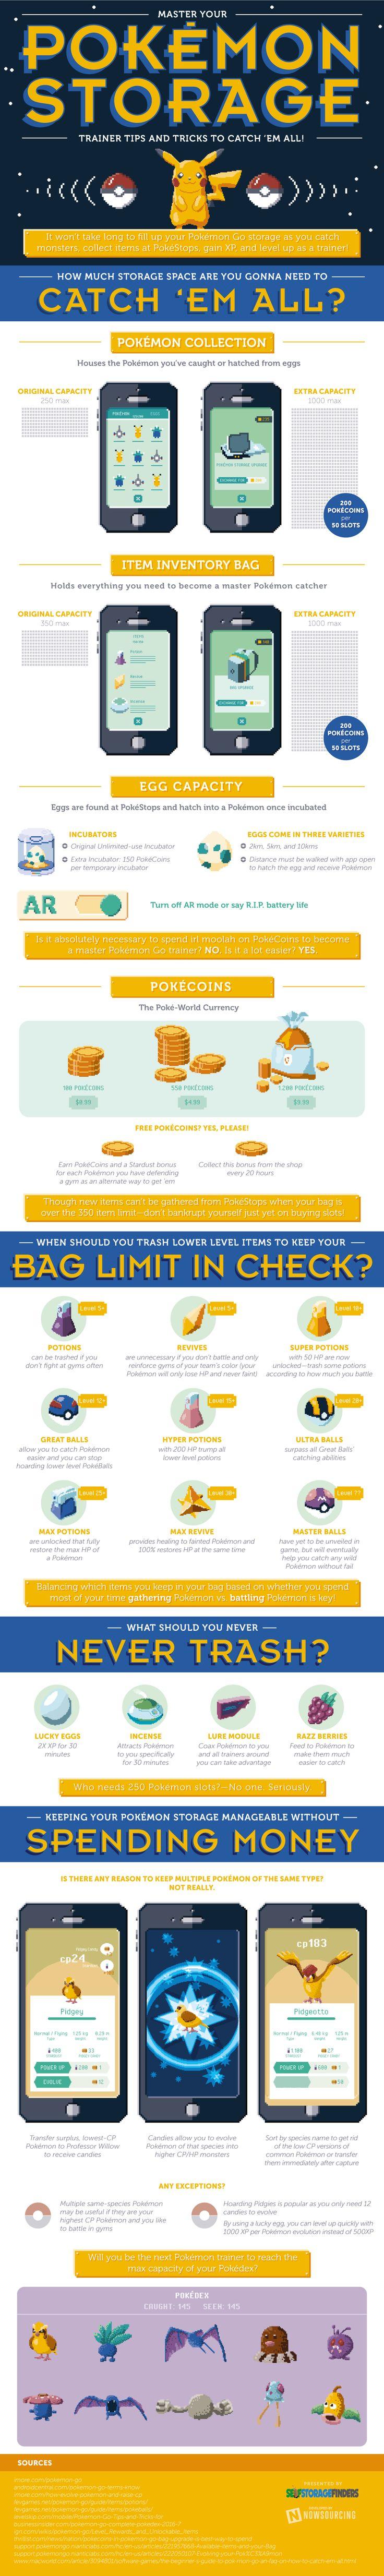 Pokemon Storage #Infographic #Pokemon